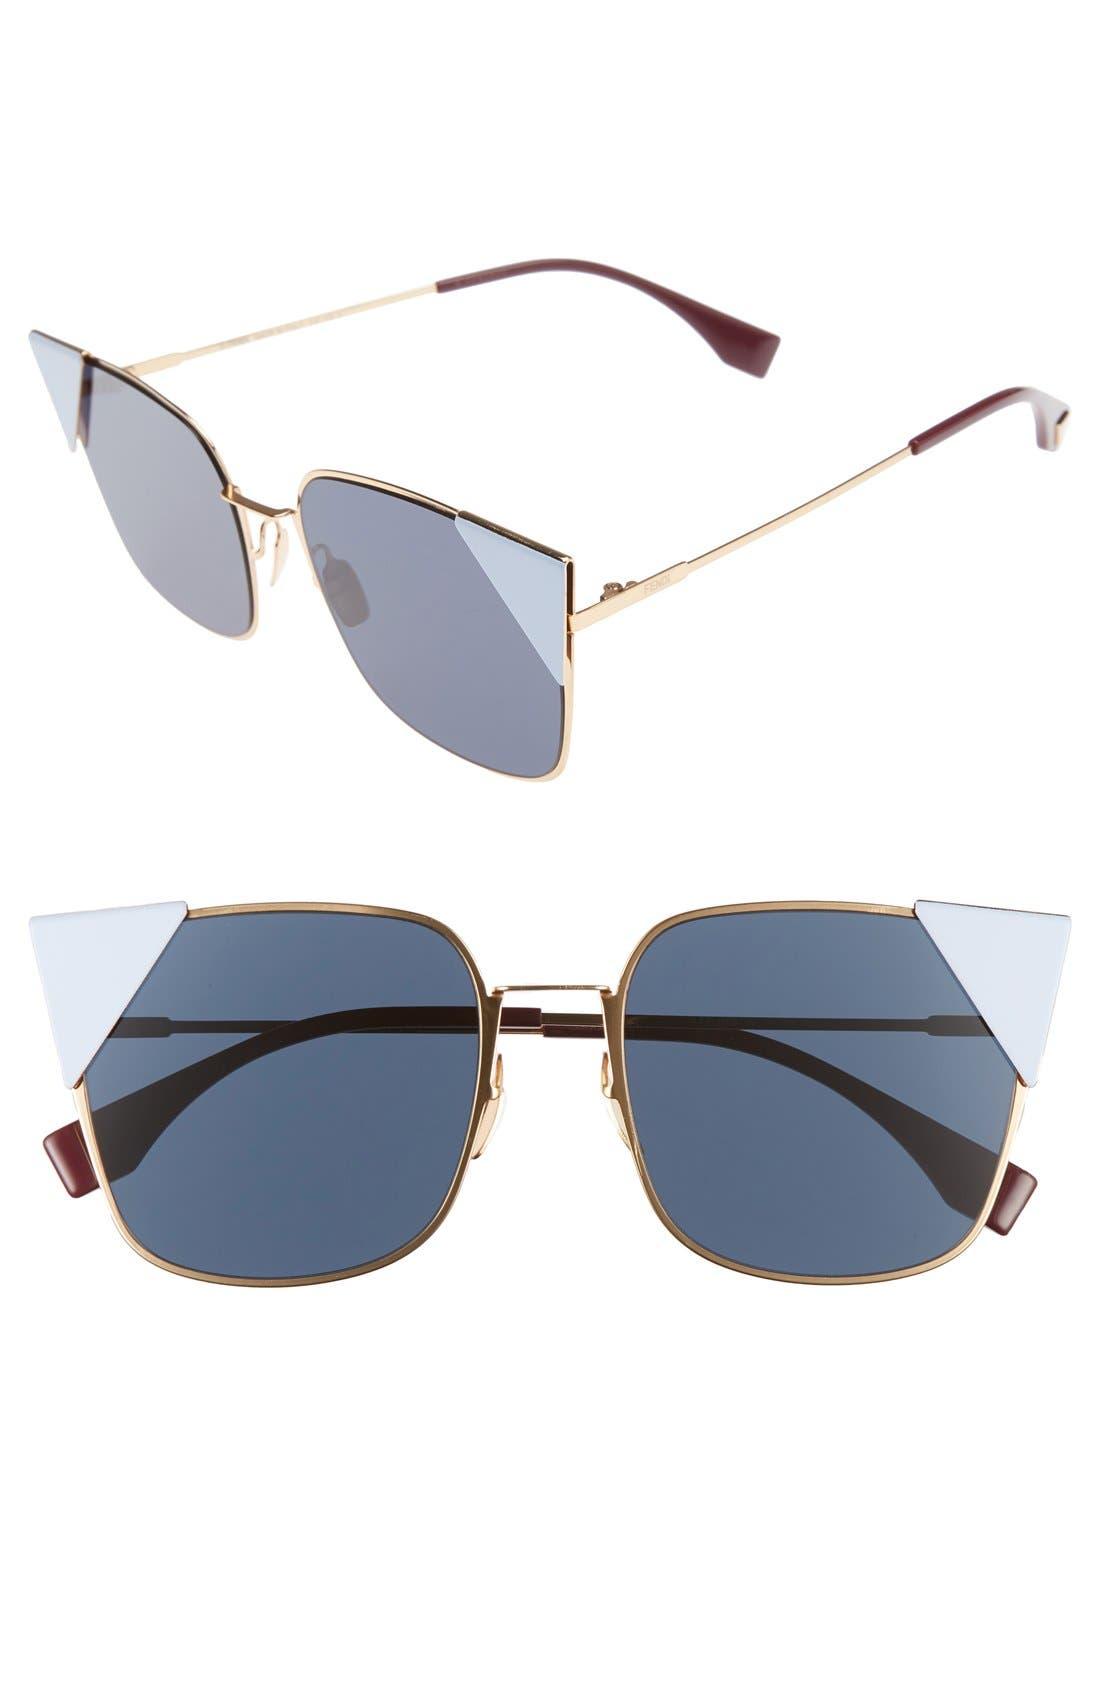 Main Image - Fendi 55mm Tipped Cat Eye Sunglasses